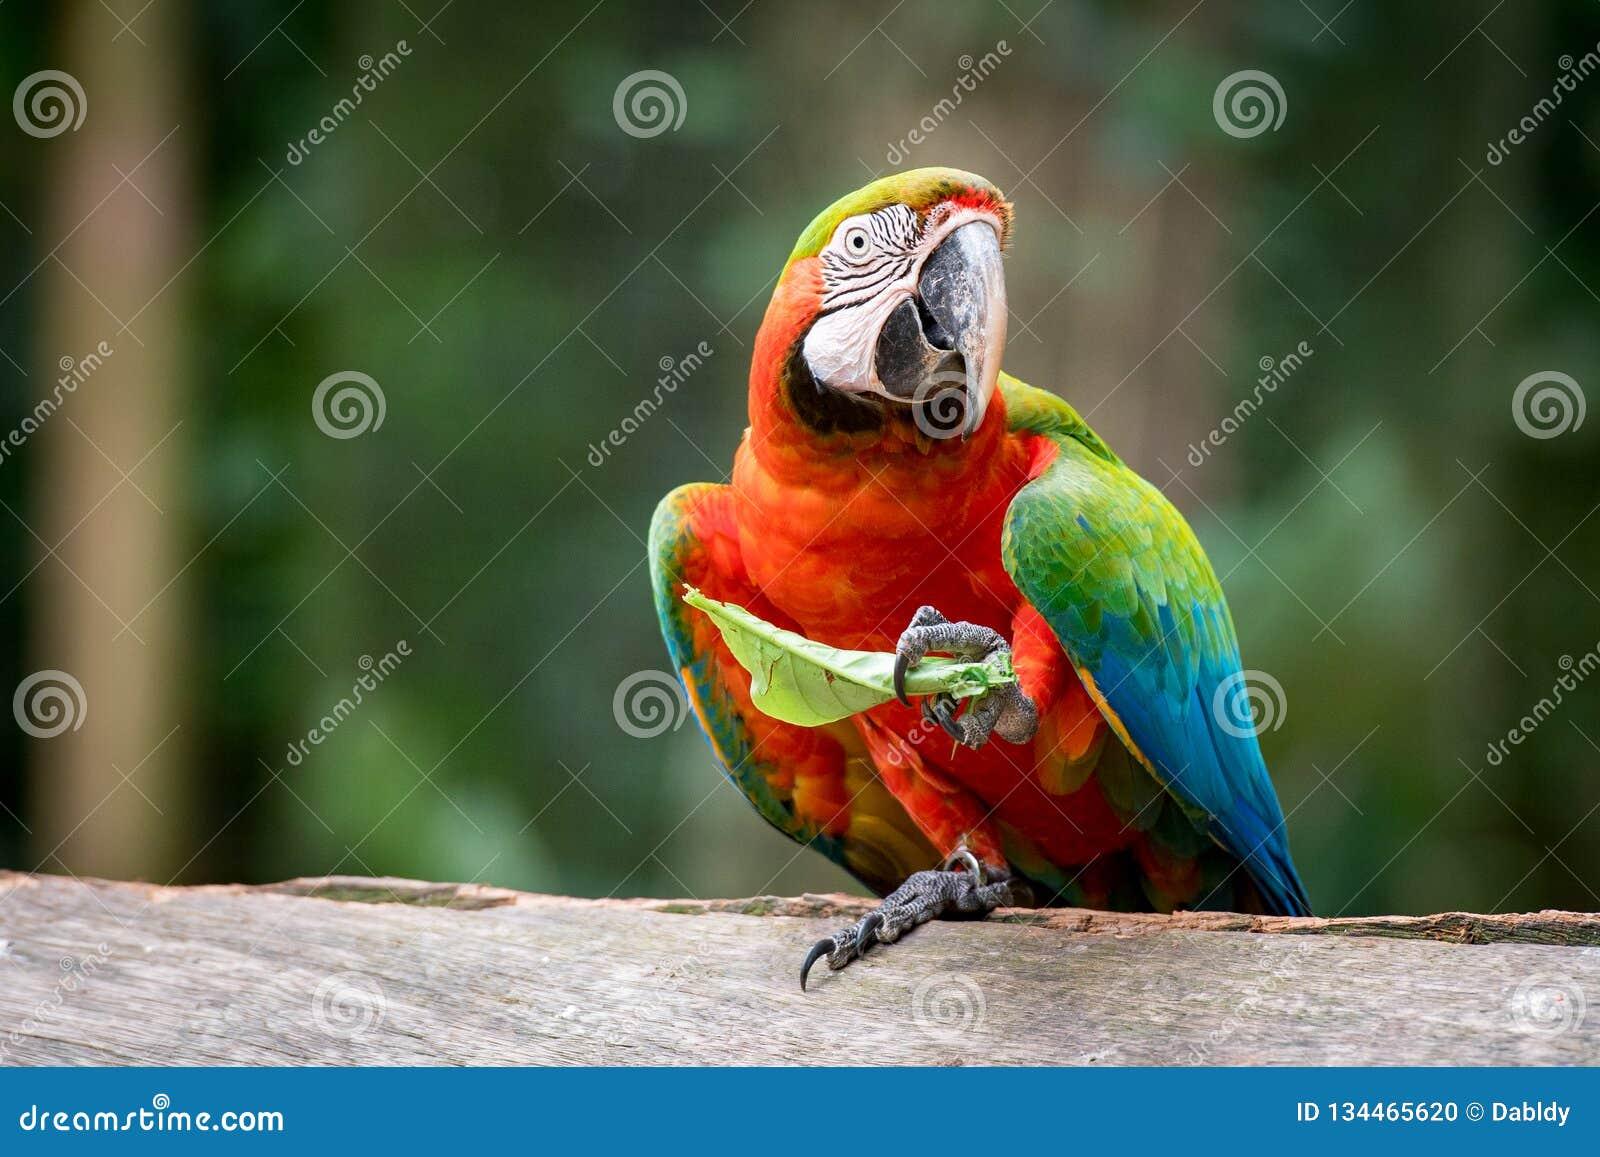 Catalina Macaw Eating Leaf